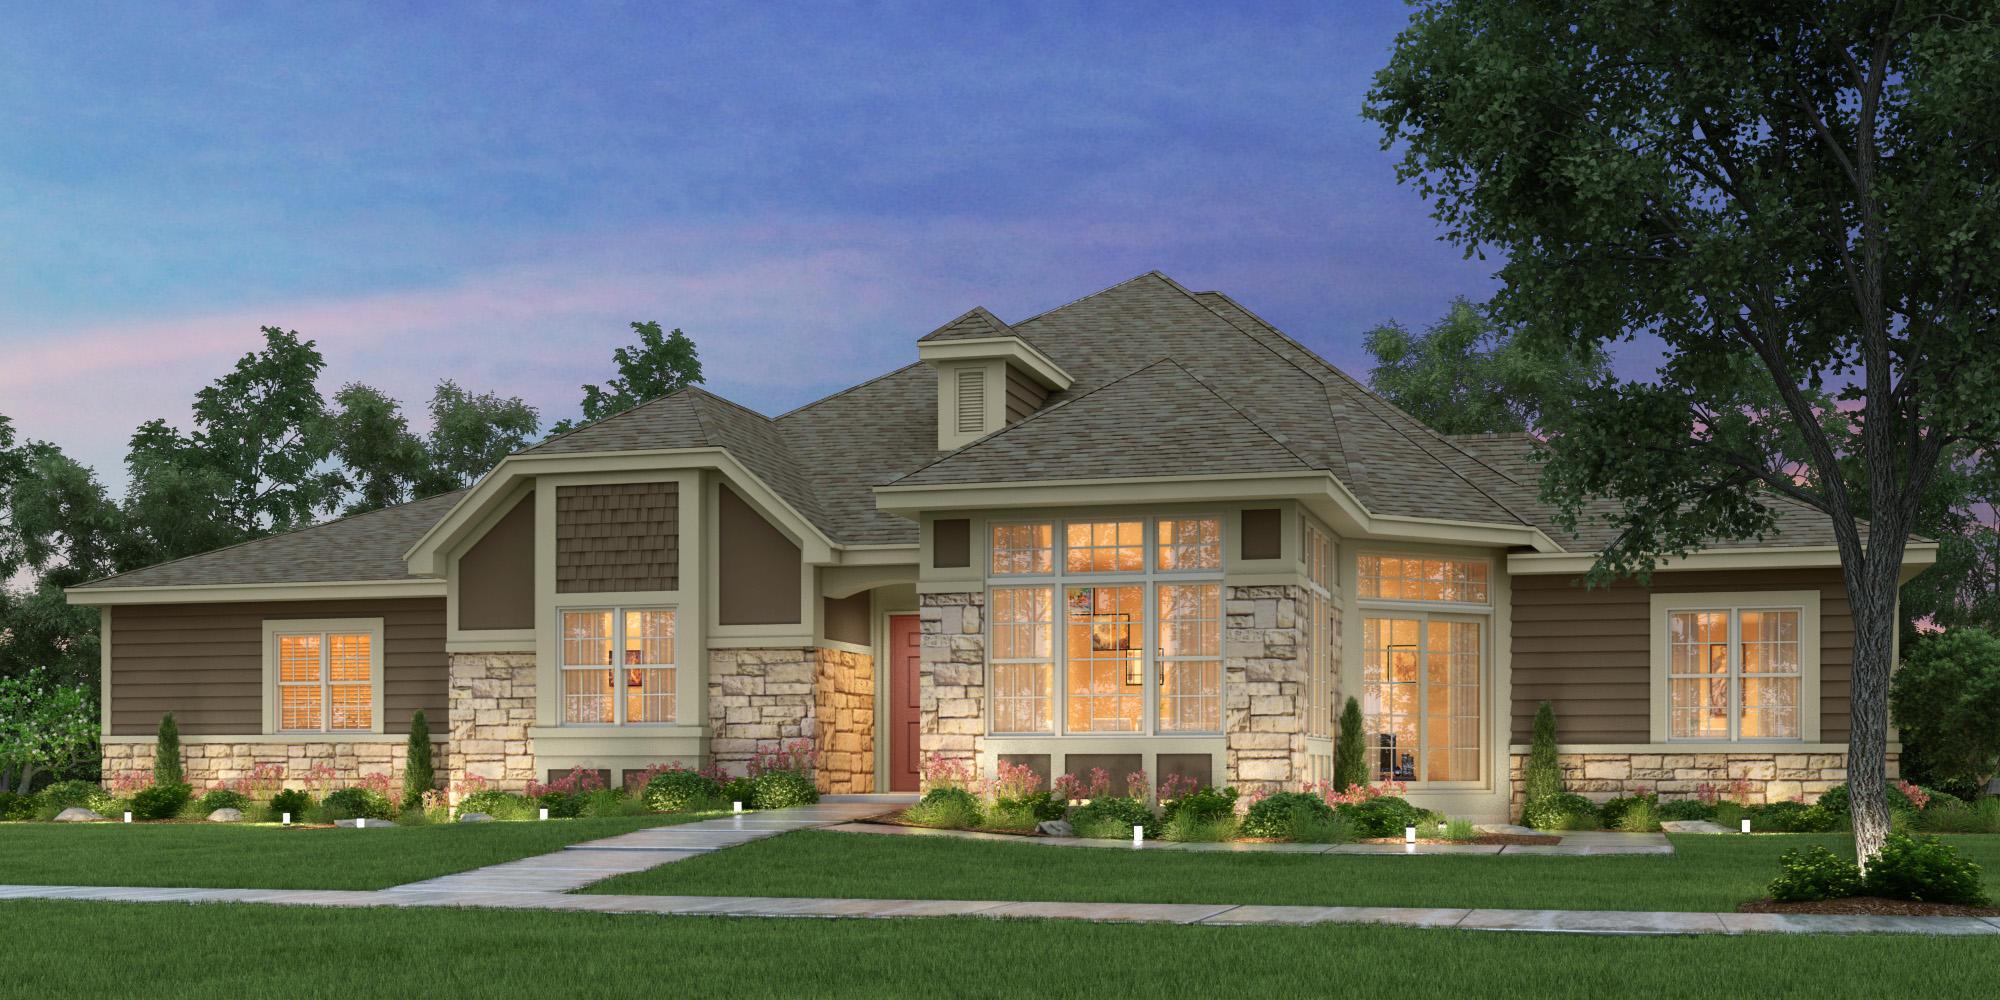 4355 Nighthawk Trl, Brookfield, Wisconsin 53005, 2 Bedrooms Bedrooms, 7 Rooms Rooms,2 BathroomsBathrooms,Condominiums,For Sale,Nighthawk Trl,1,1717151